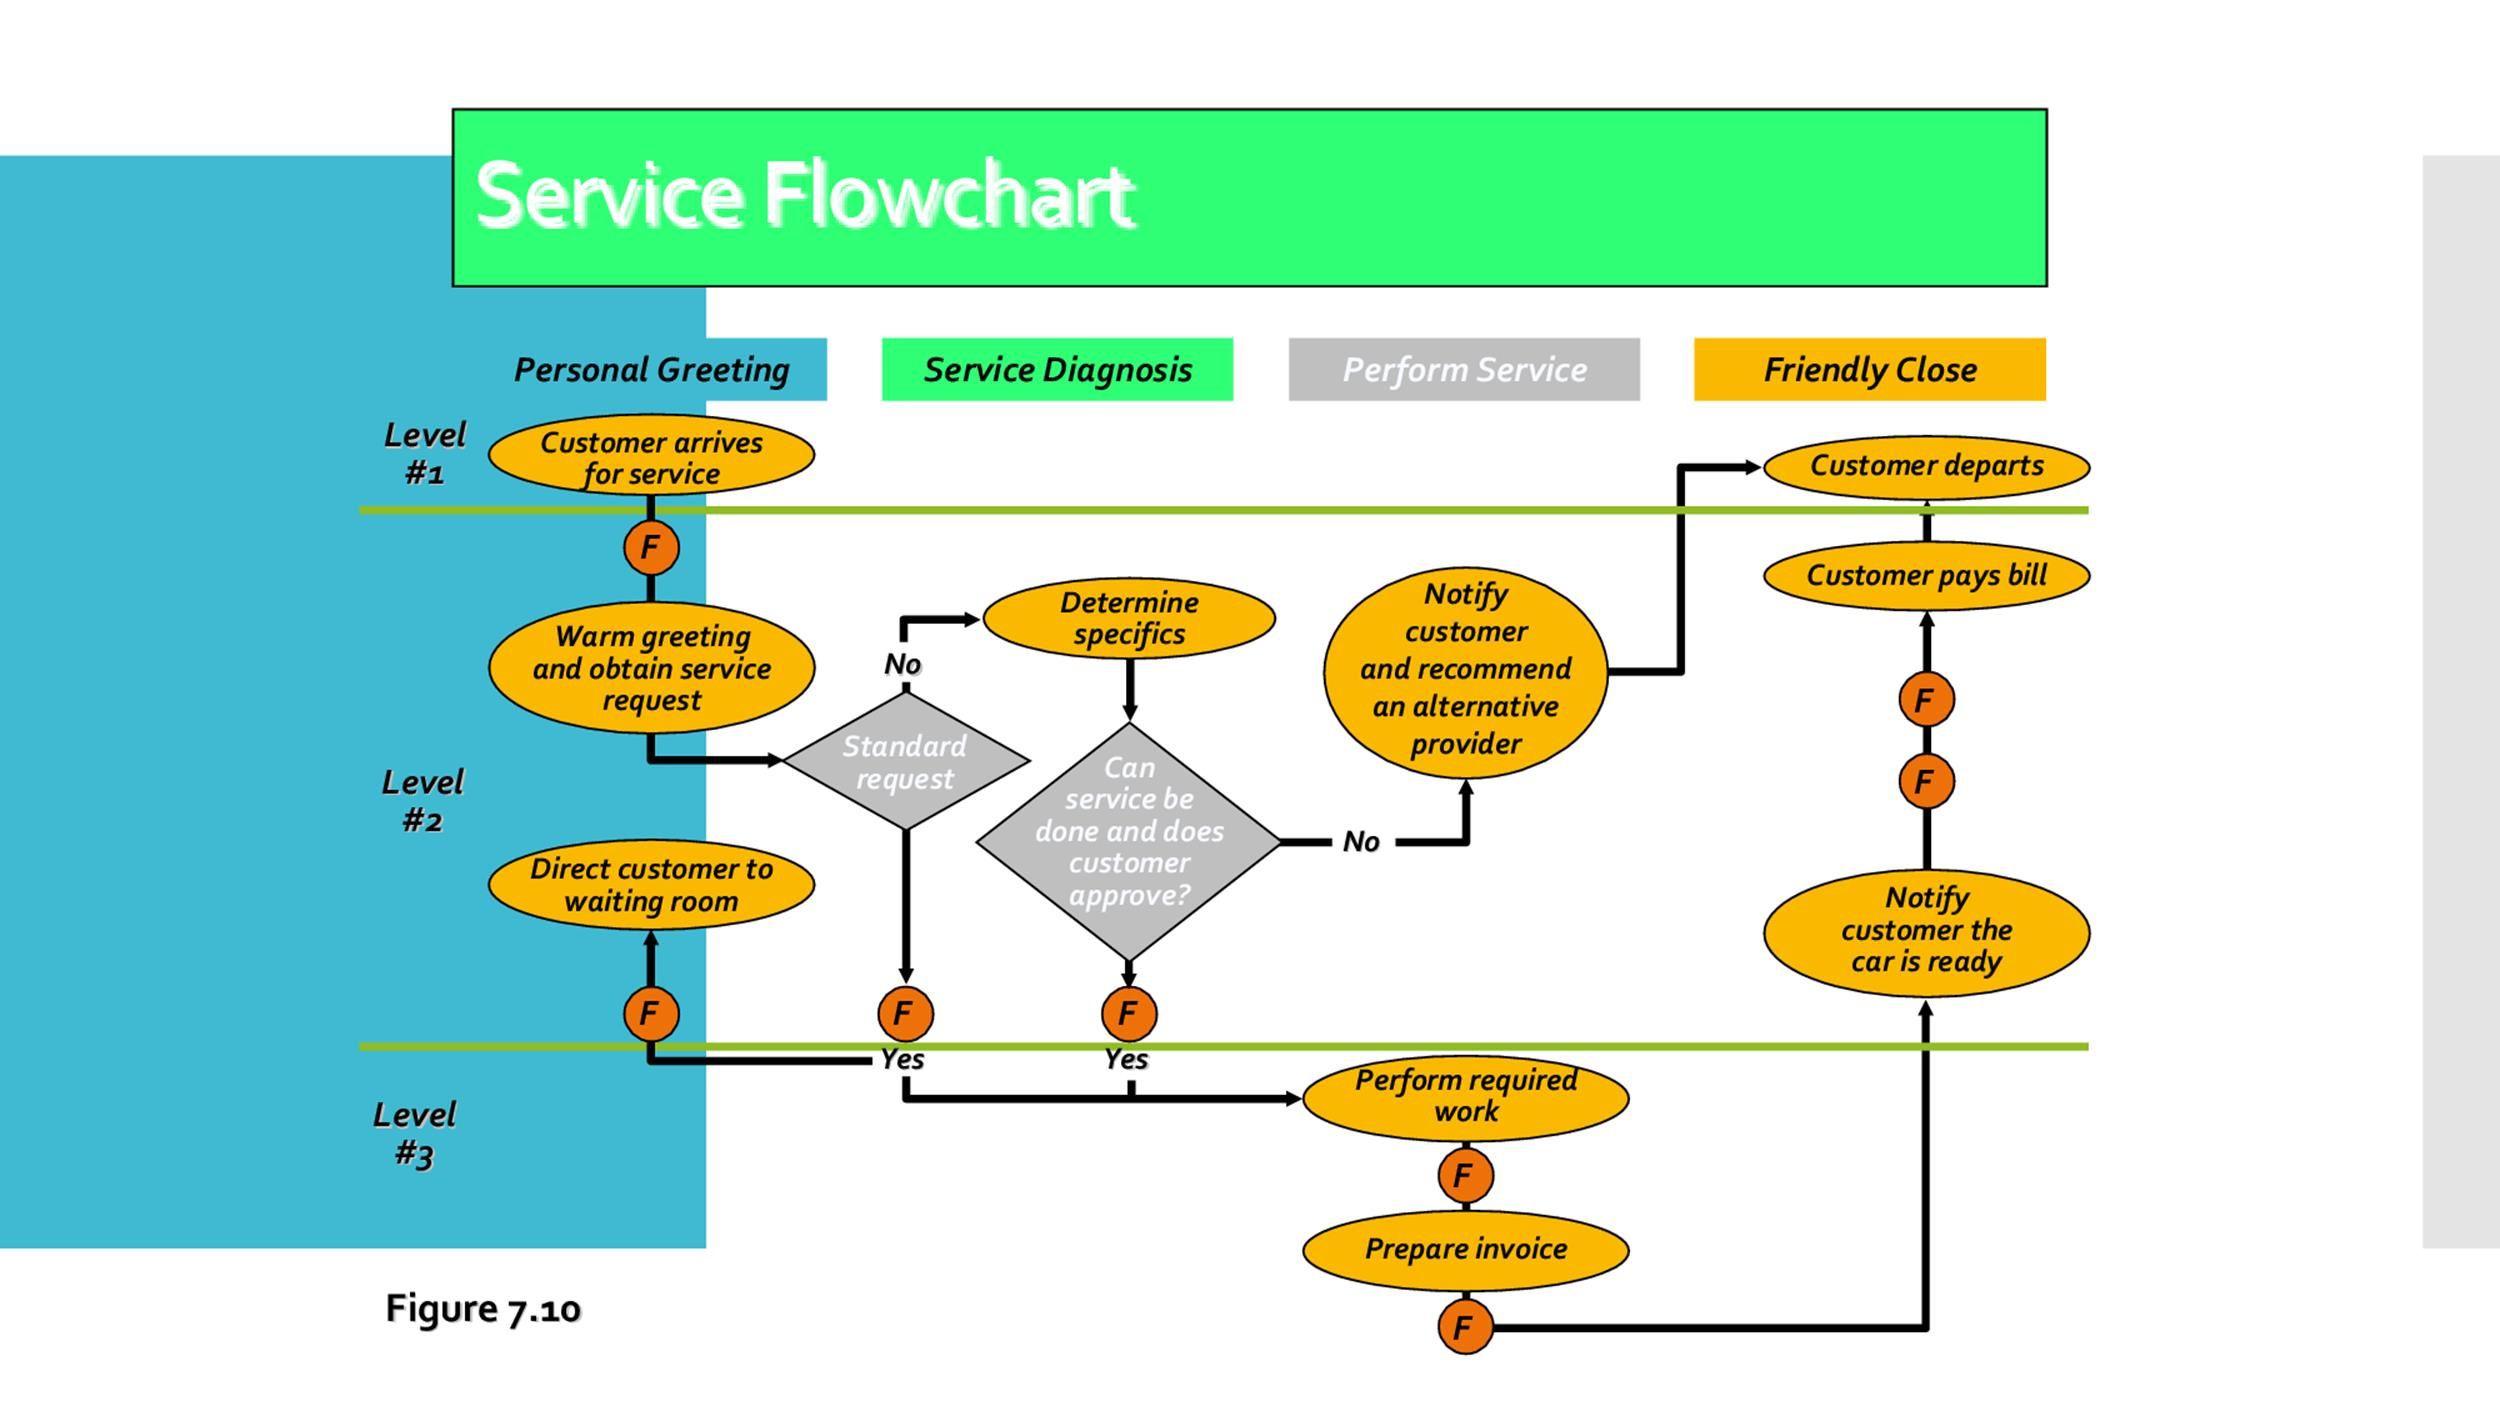 008 Marvelou Flow Chart Microsoft Excel Example  Flowchart TemplateFull